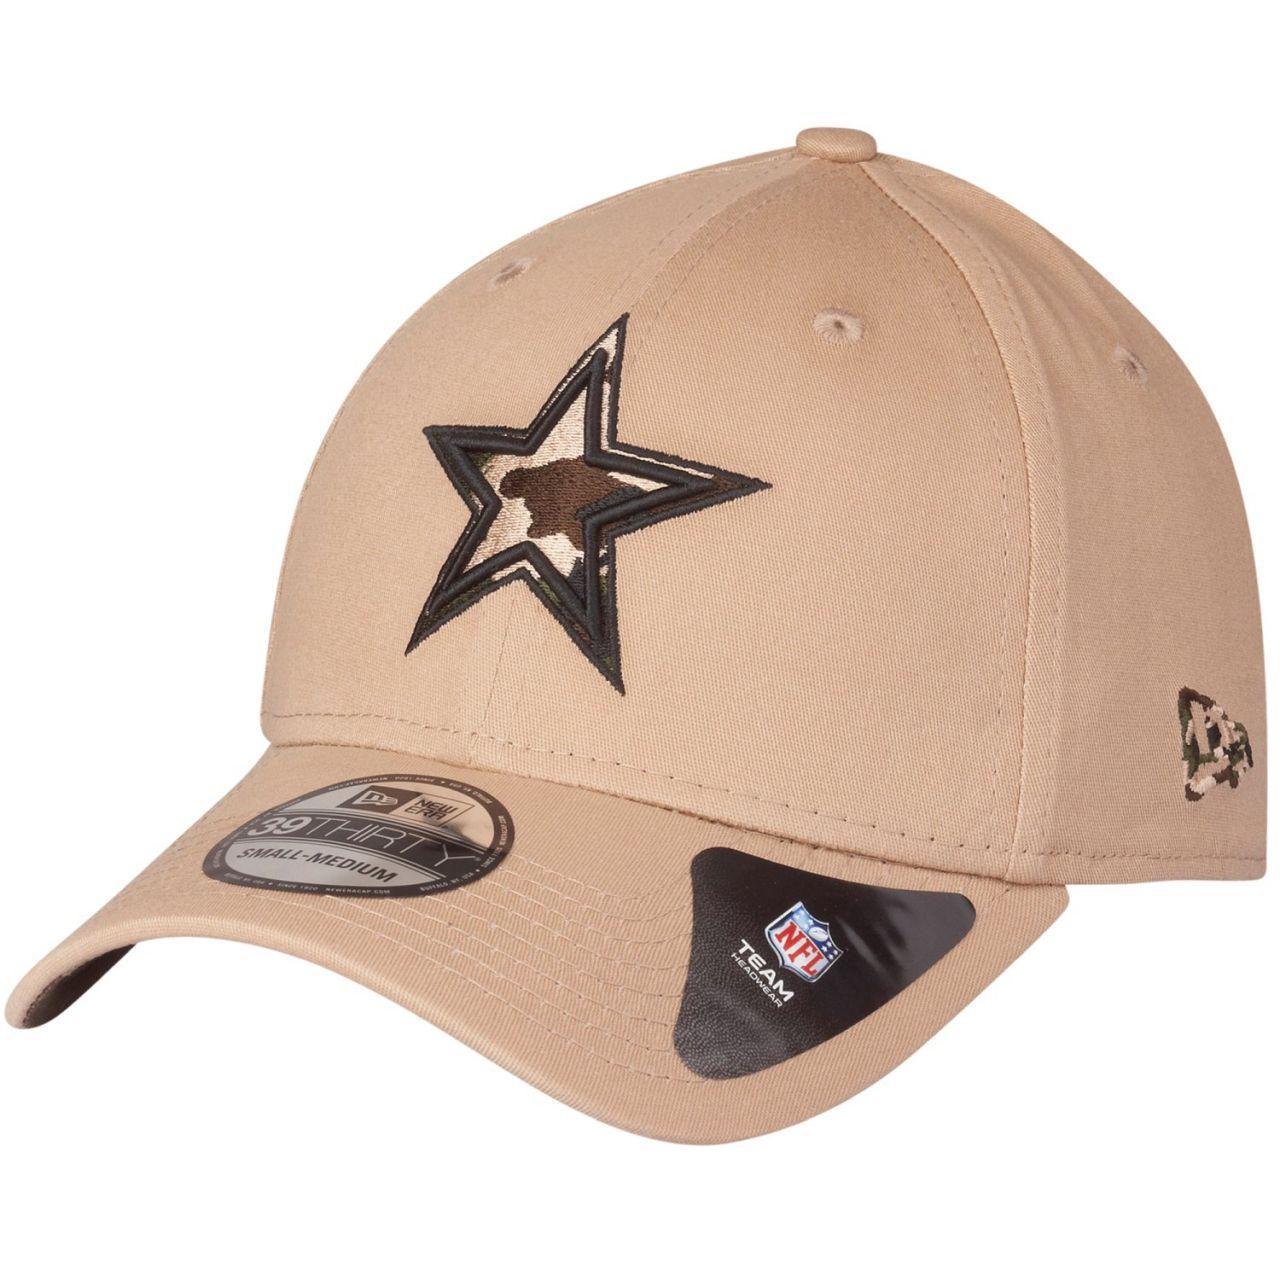 amfoo - New Era 39Thirty Stretch Cap - CAMO Dallas Cowboys